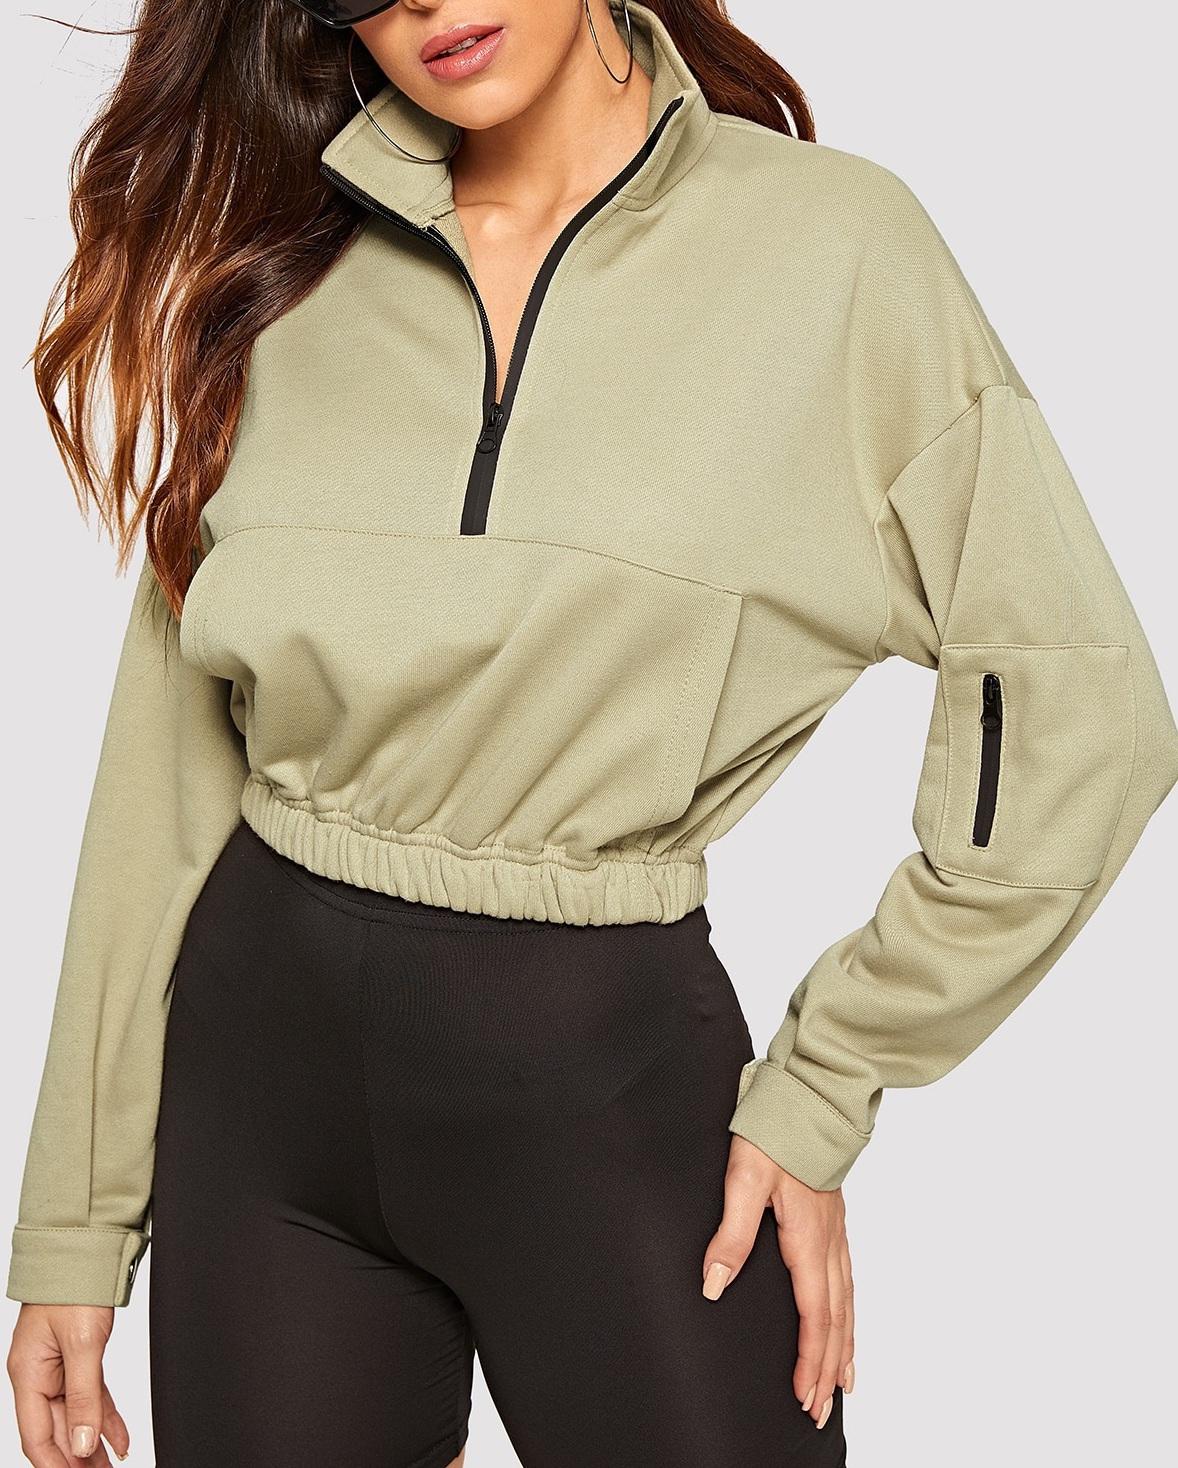 sweater girly girl girly wishlist cropped cropped sweater crop half zip zip trendy